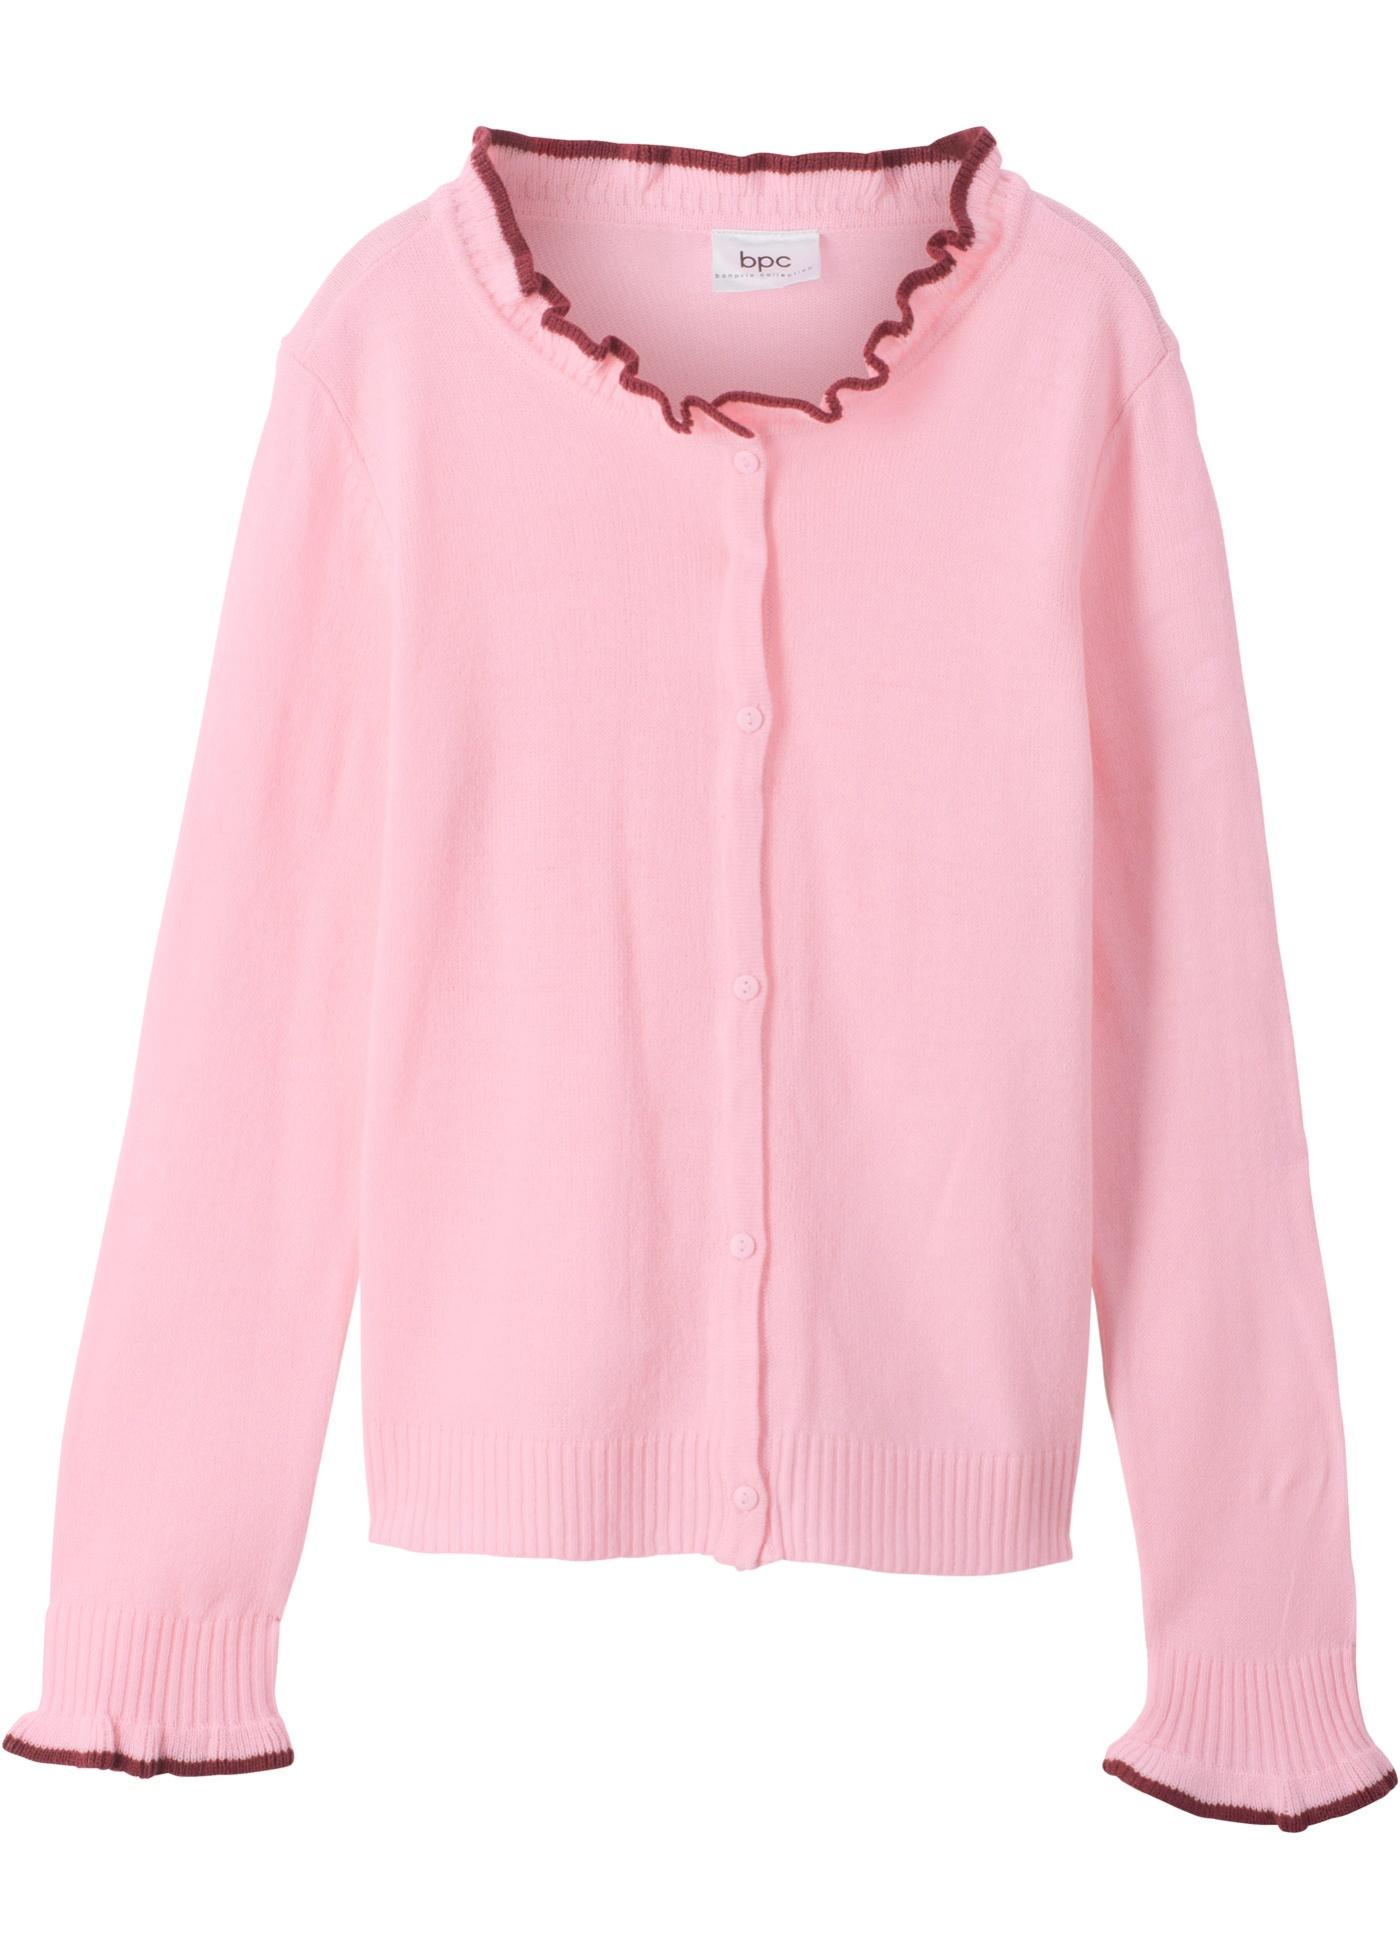 Pletený kabátek - Růžová